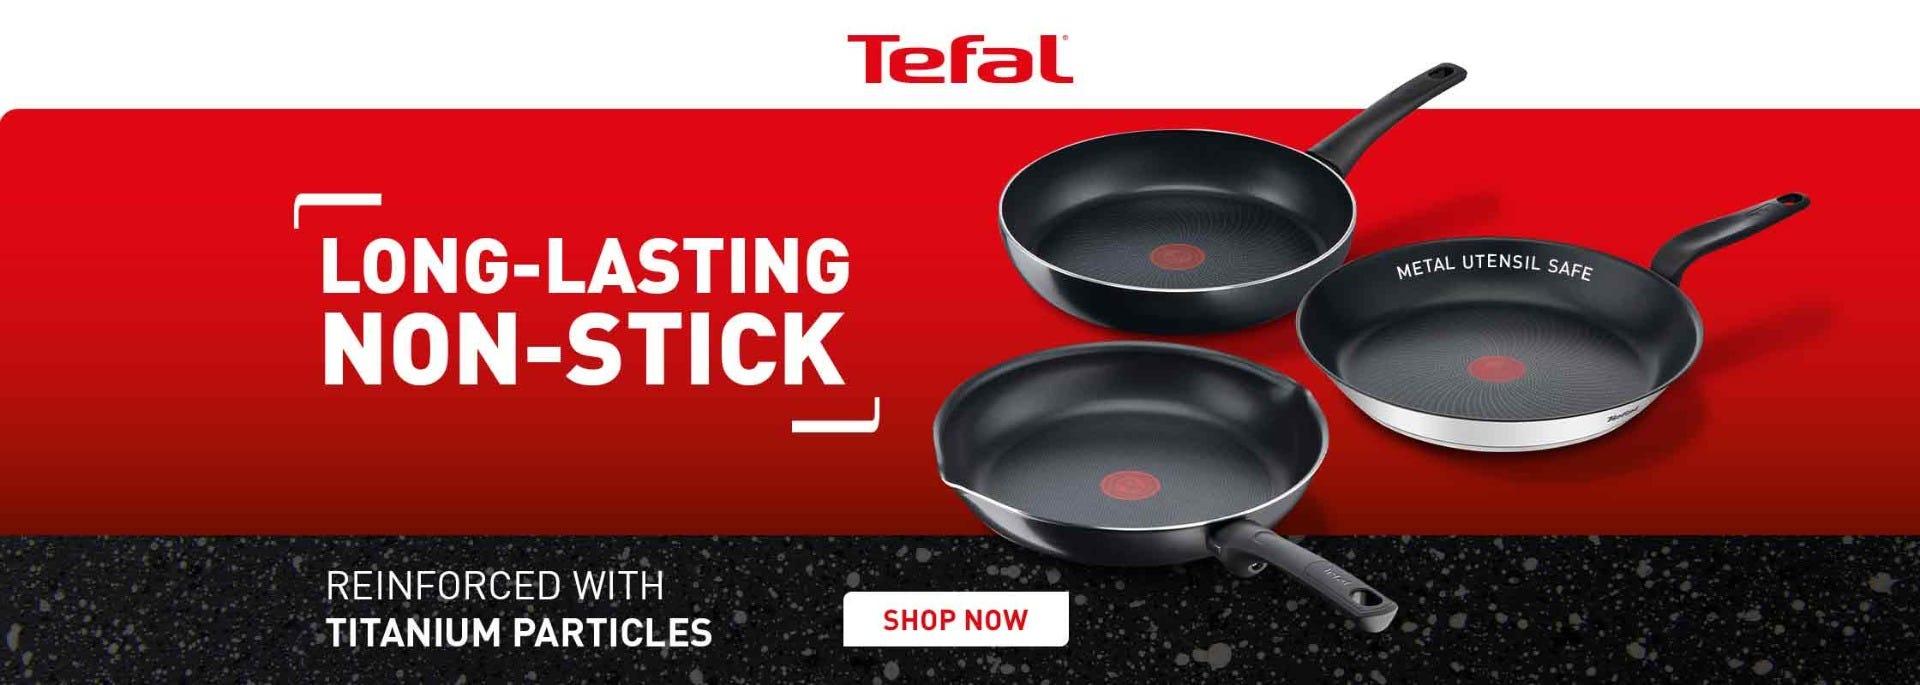 Tefal titanium excel pan